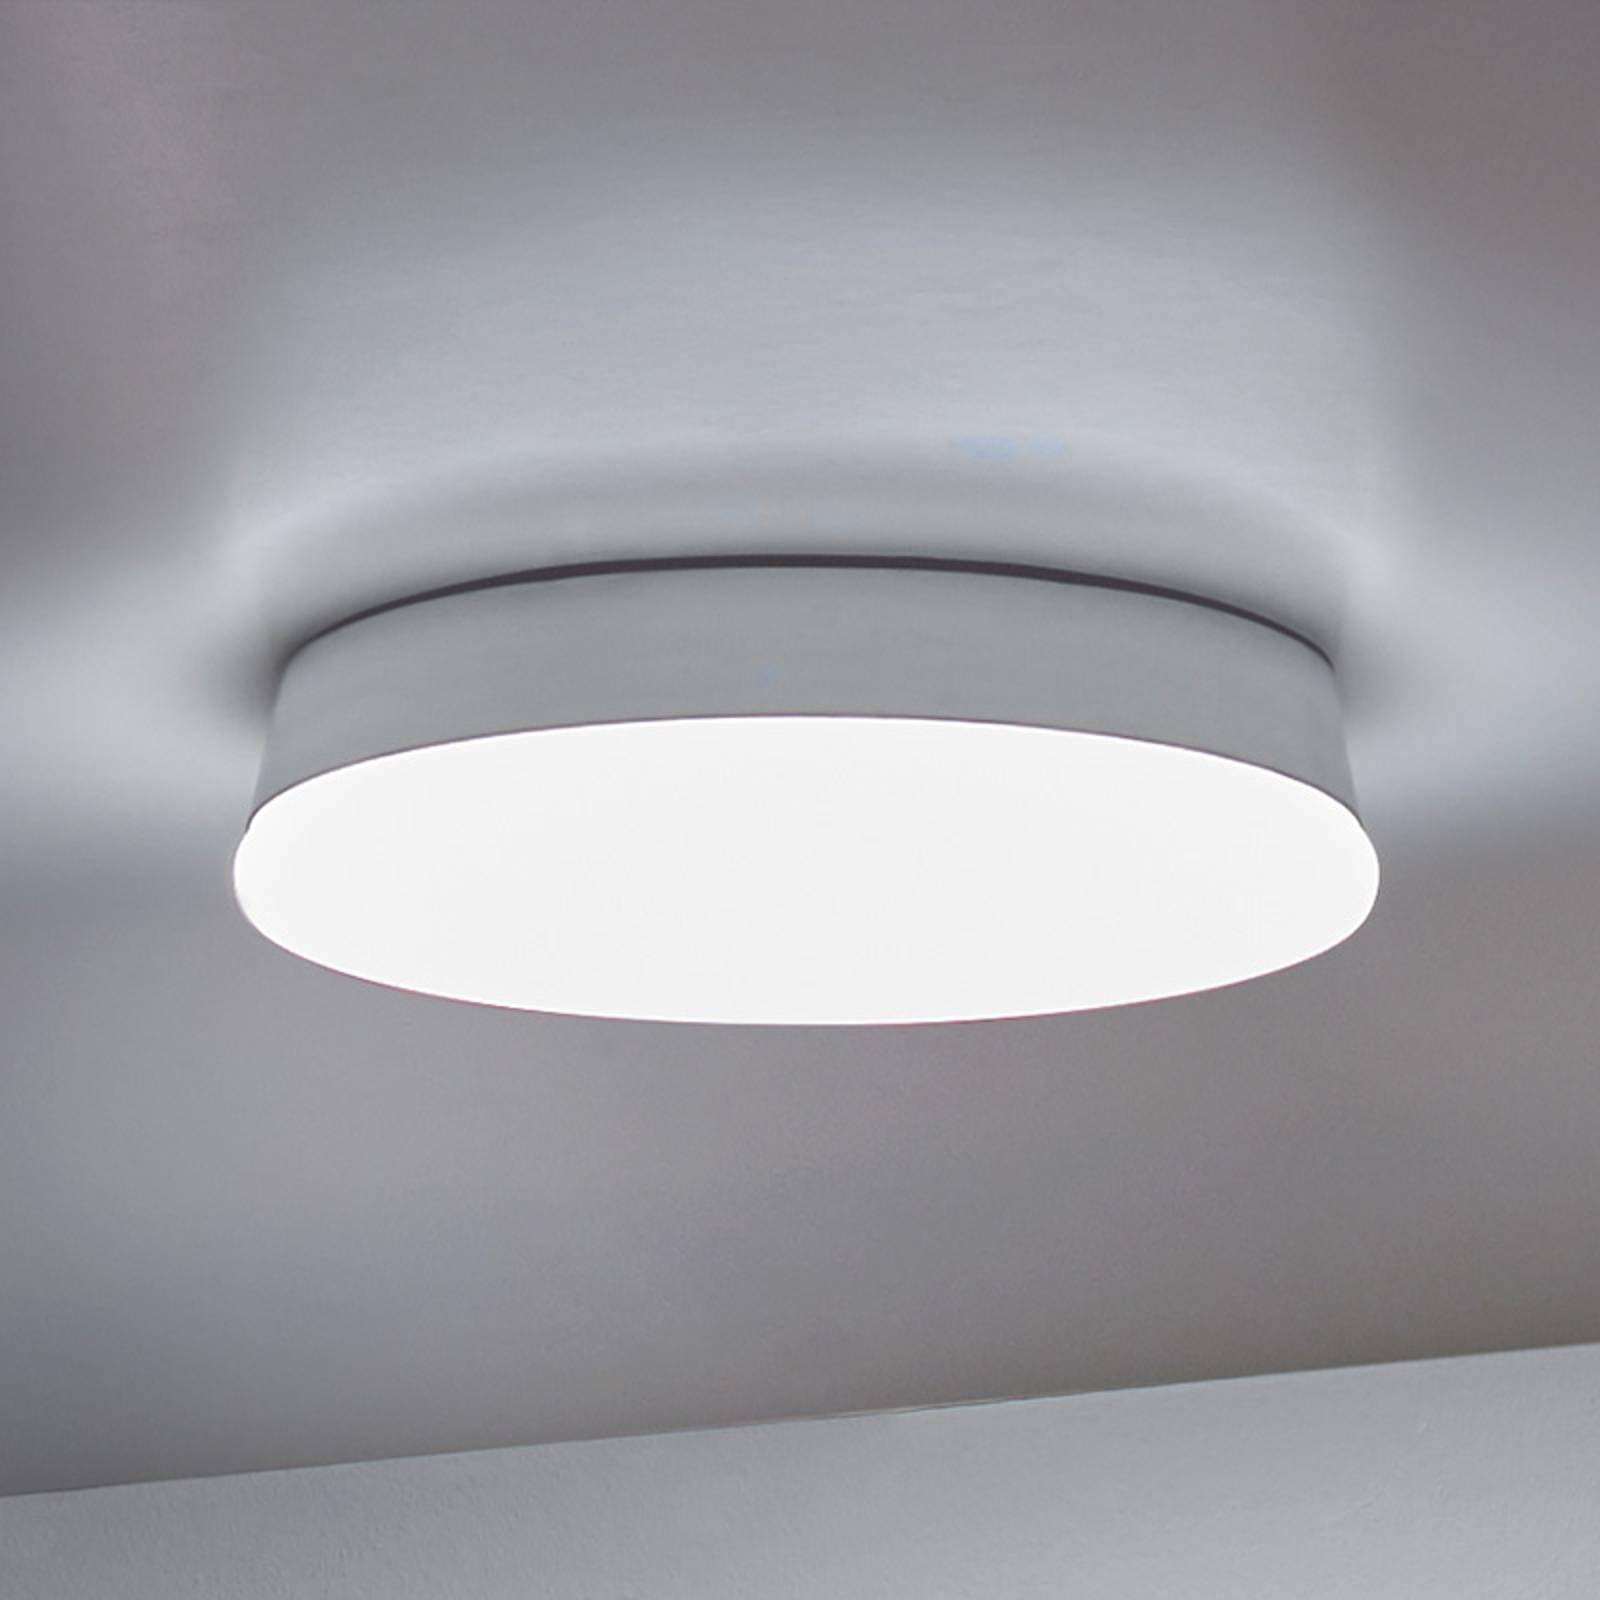 LEDS-C4 Circle LED plafondlamp van glas